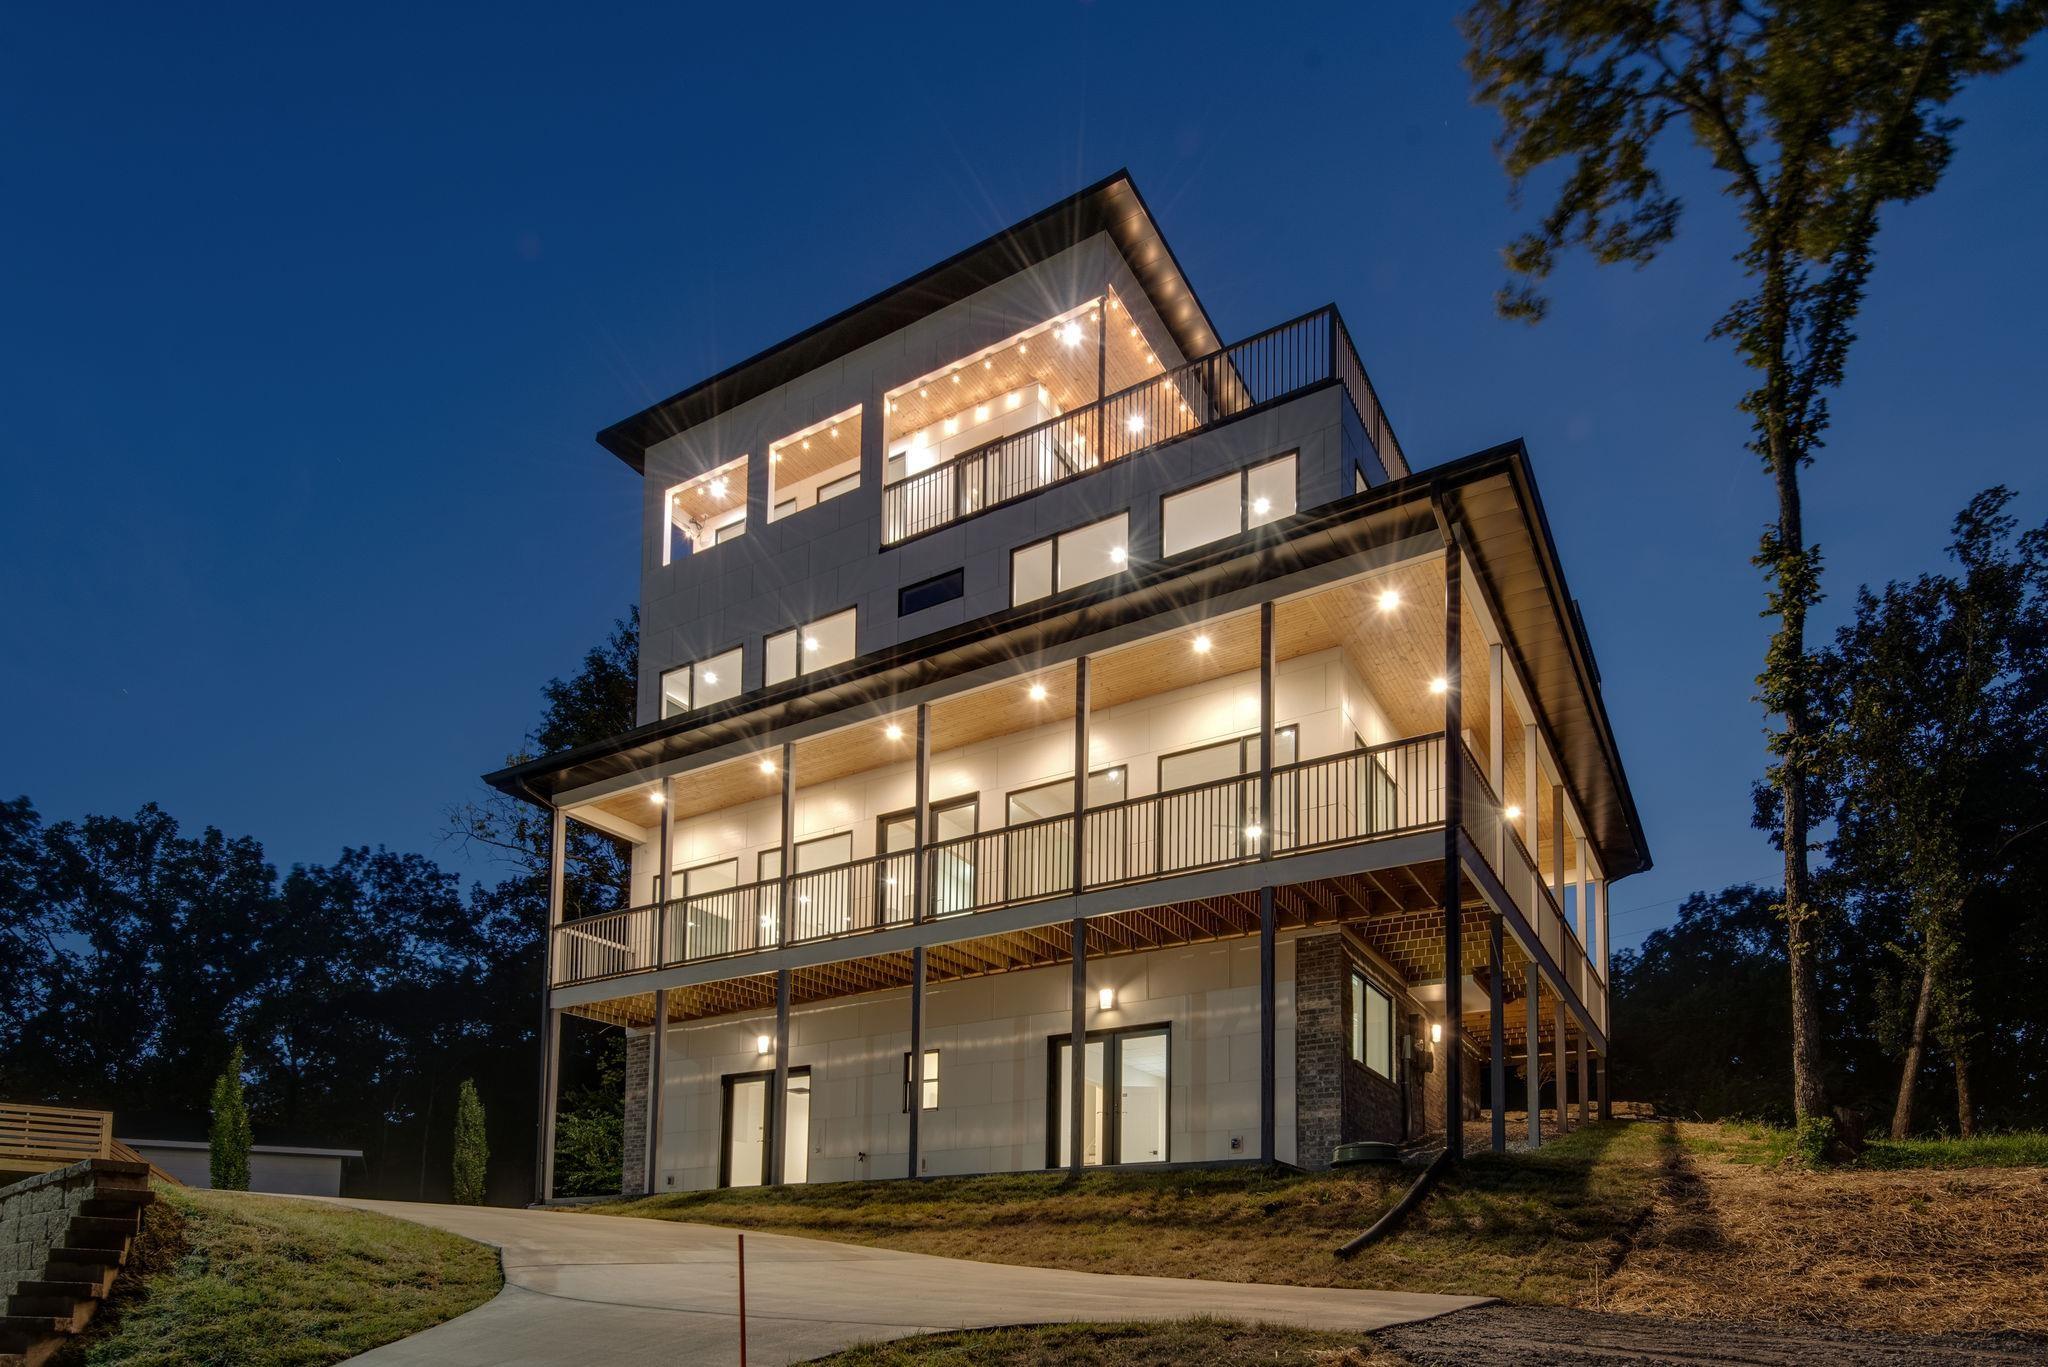 6118 Hill Circle Dr, Nashville, TN 37209 - Nashville, TN real estate listing